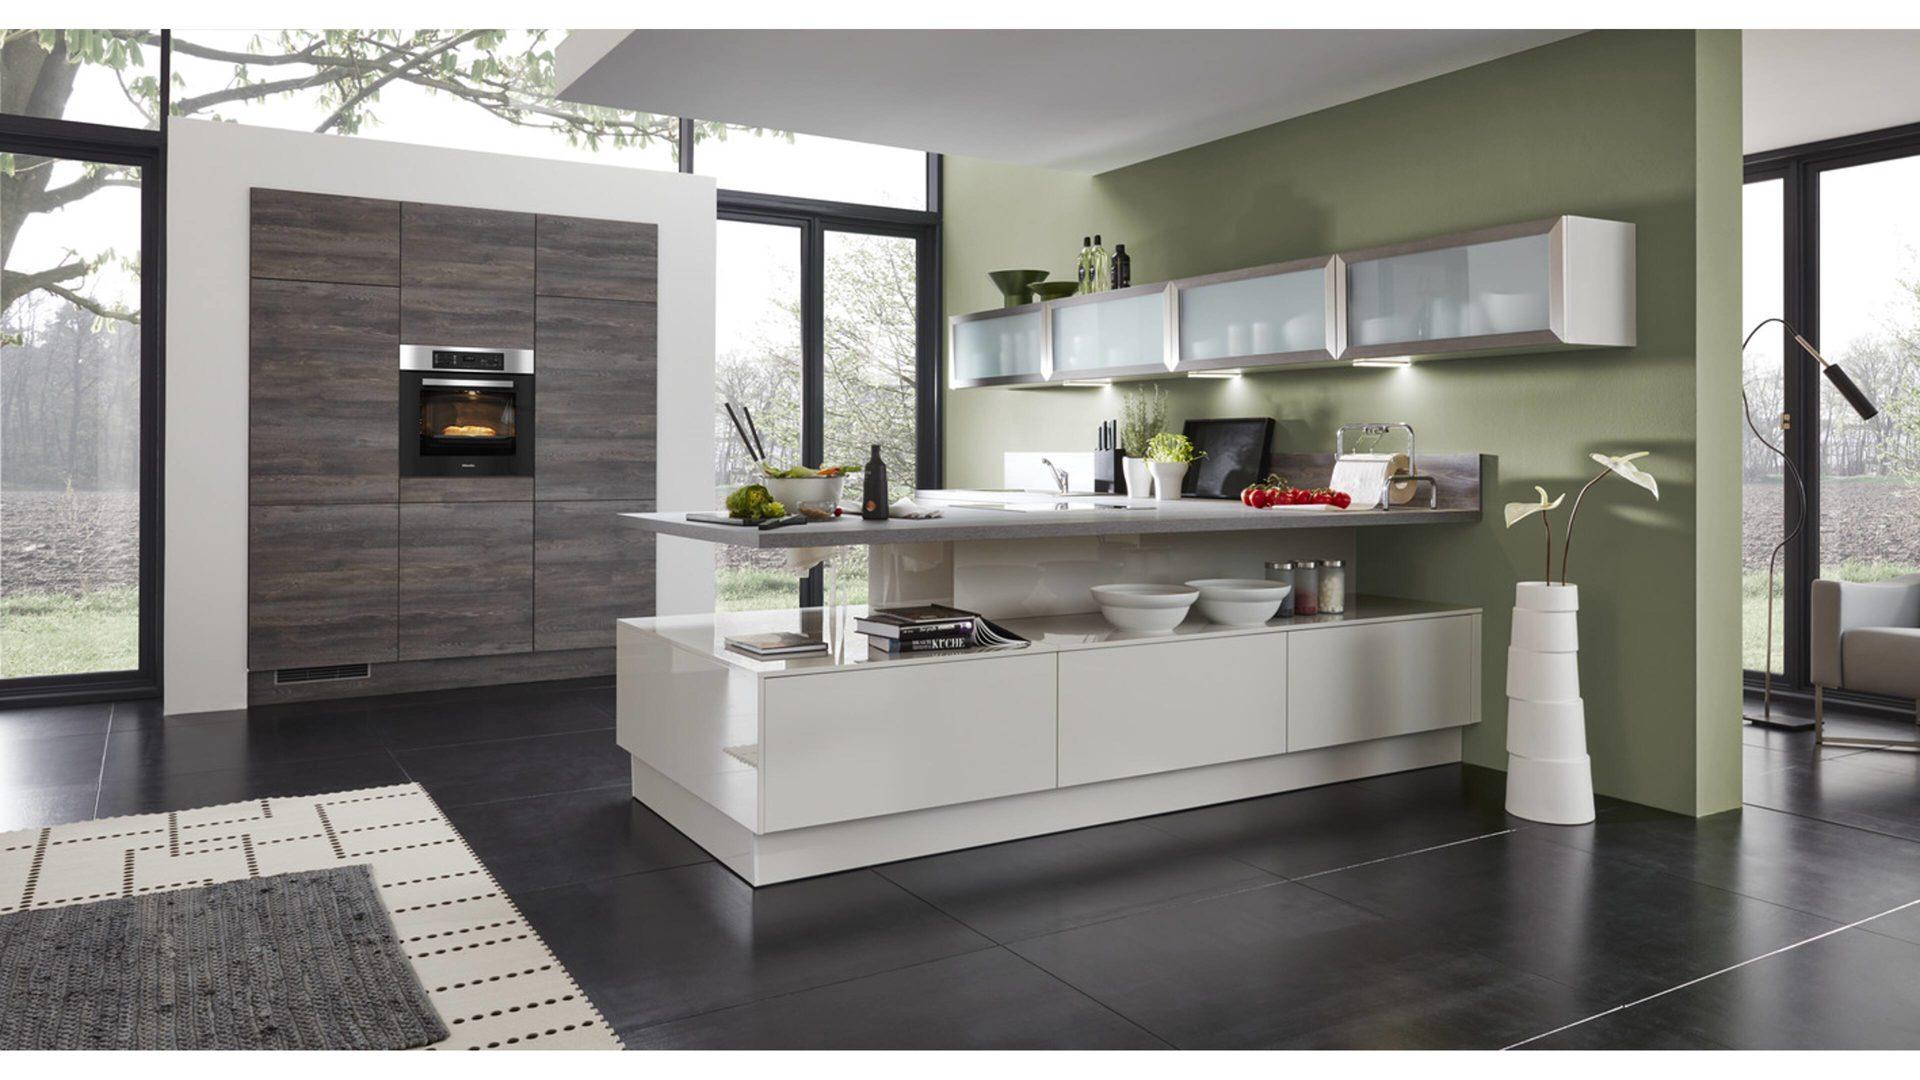 Möbel Boer Coesfeld, Möbel A-Z, Küchen, Culineo, Culineo Küche mit ...